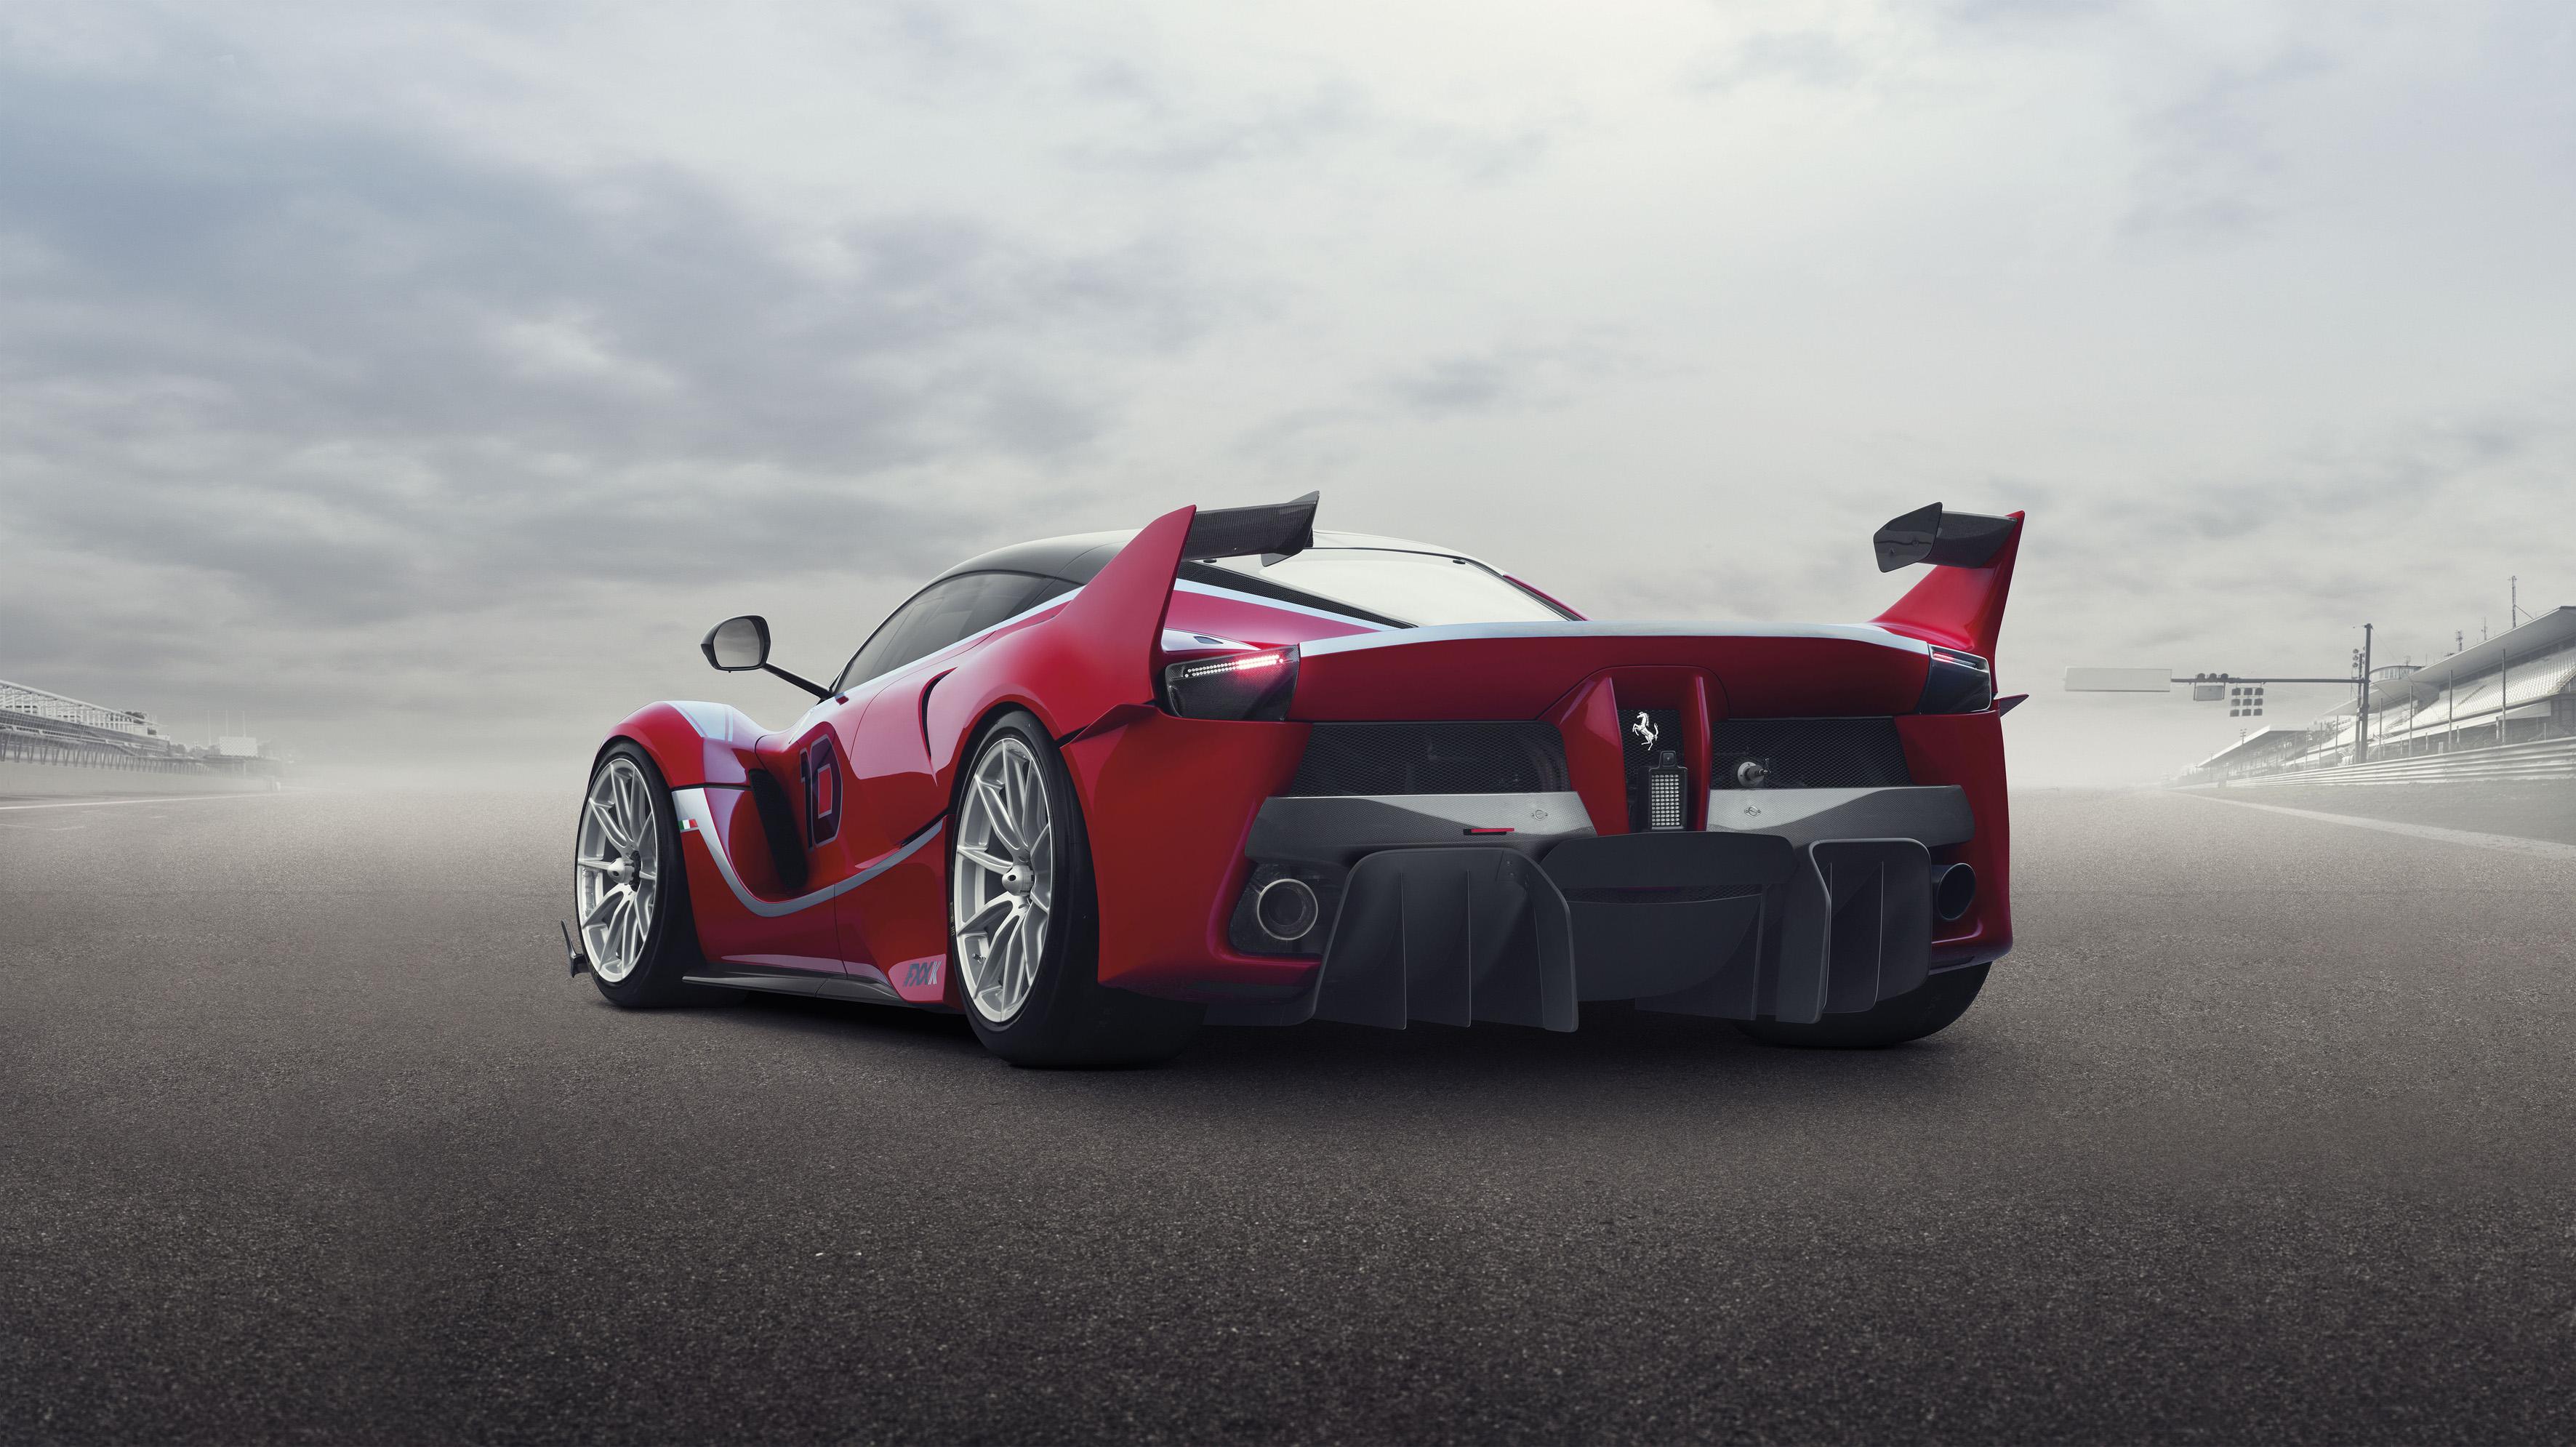 FXX K: prima mondiale alle Finali Mondiali Ferrari di Abu Dhabi